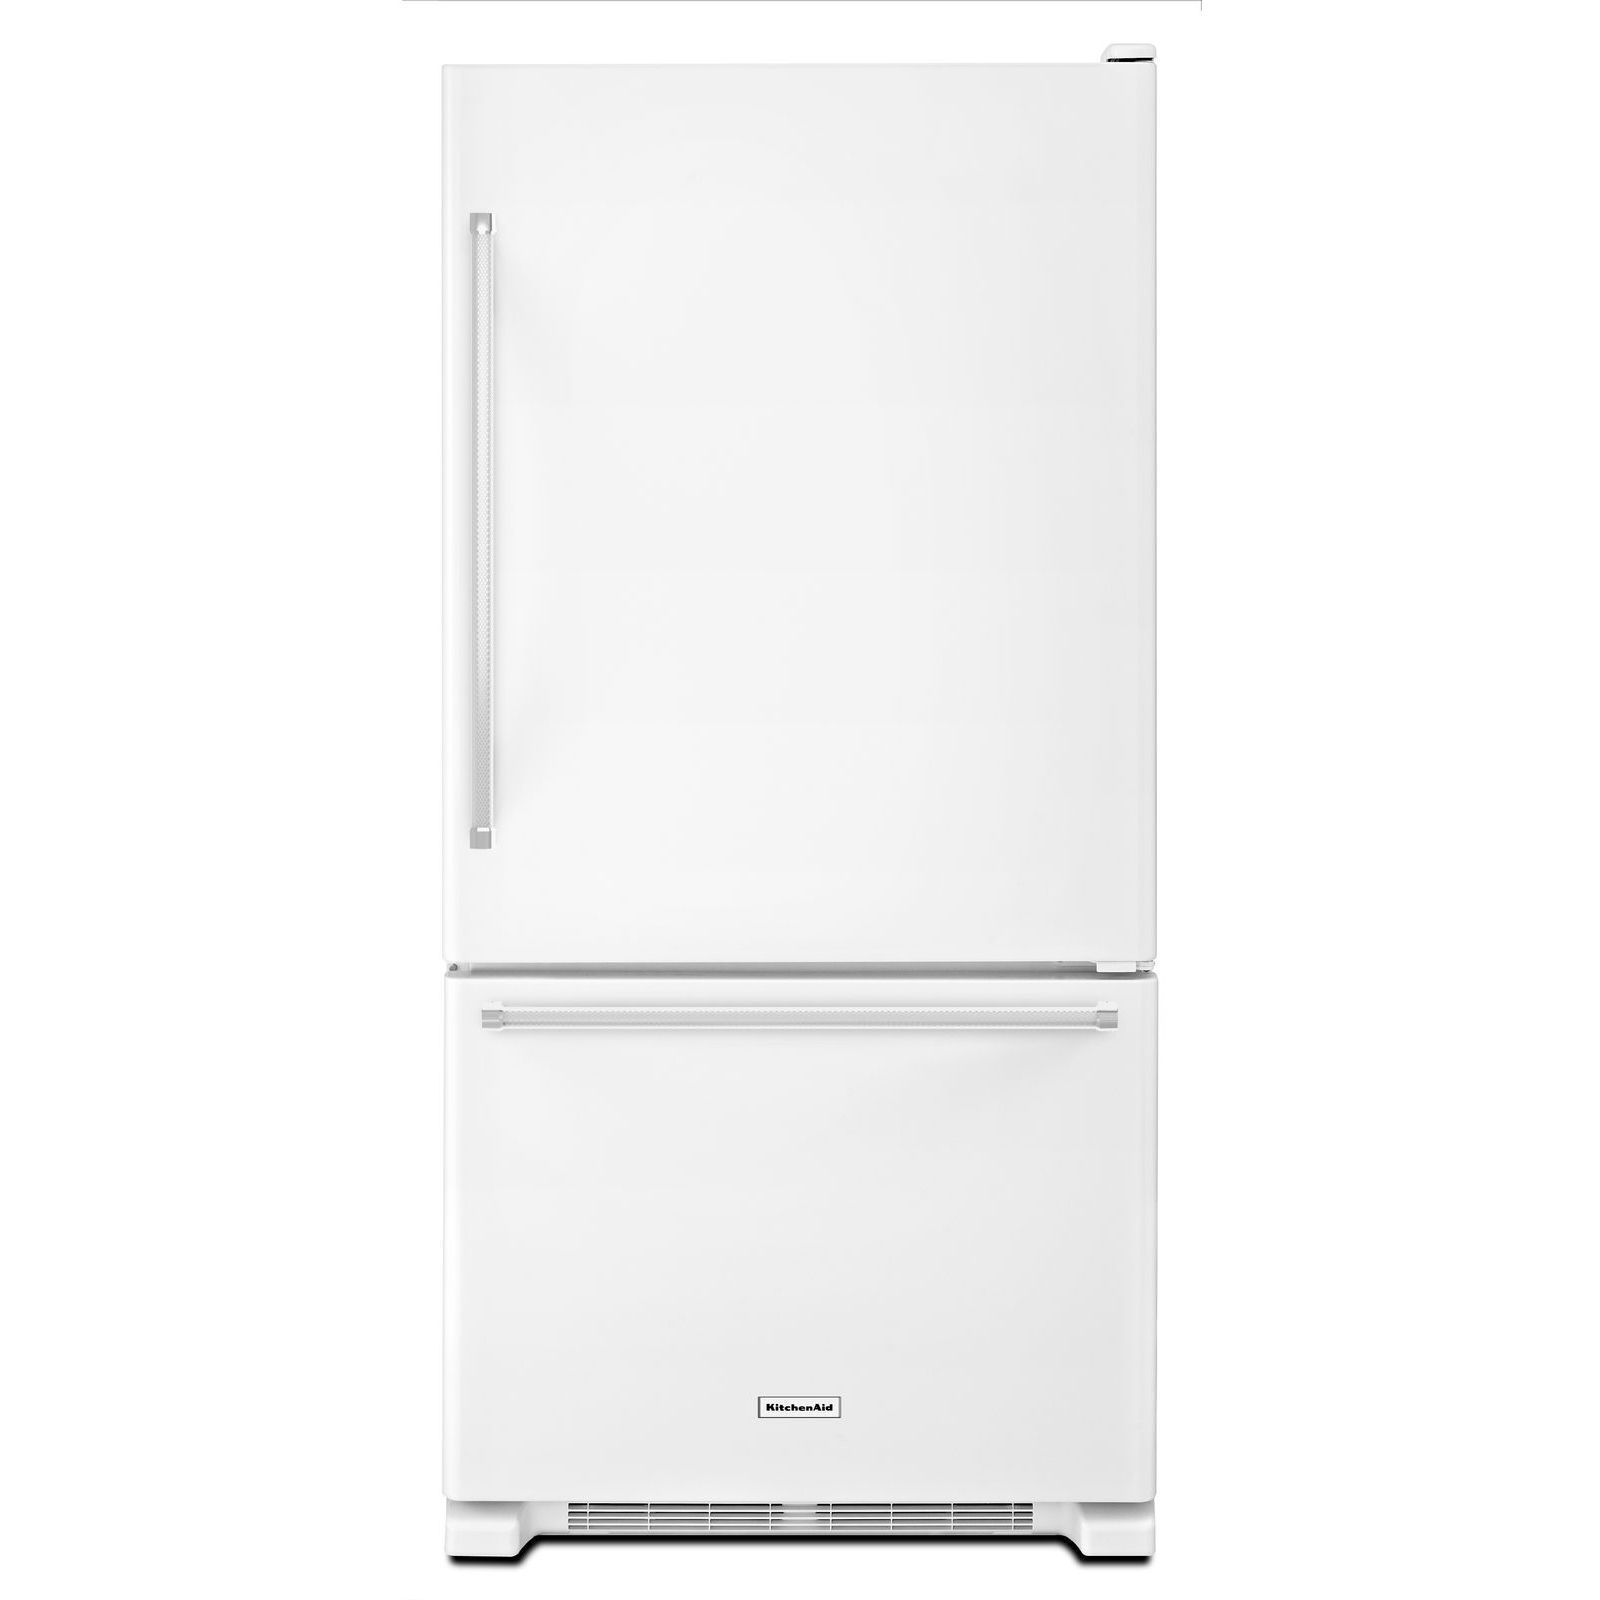 Kitchenaid Krbx109ewh 19 Cu Ft Bottom Mount Refrigerator White Sears Outlet Bottom Freezer Bottom Freezer Refrigerator Kitchenaid Refrigerator